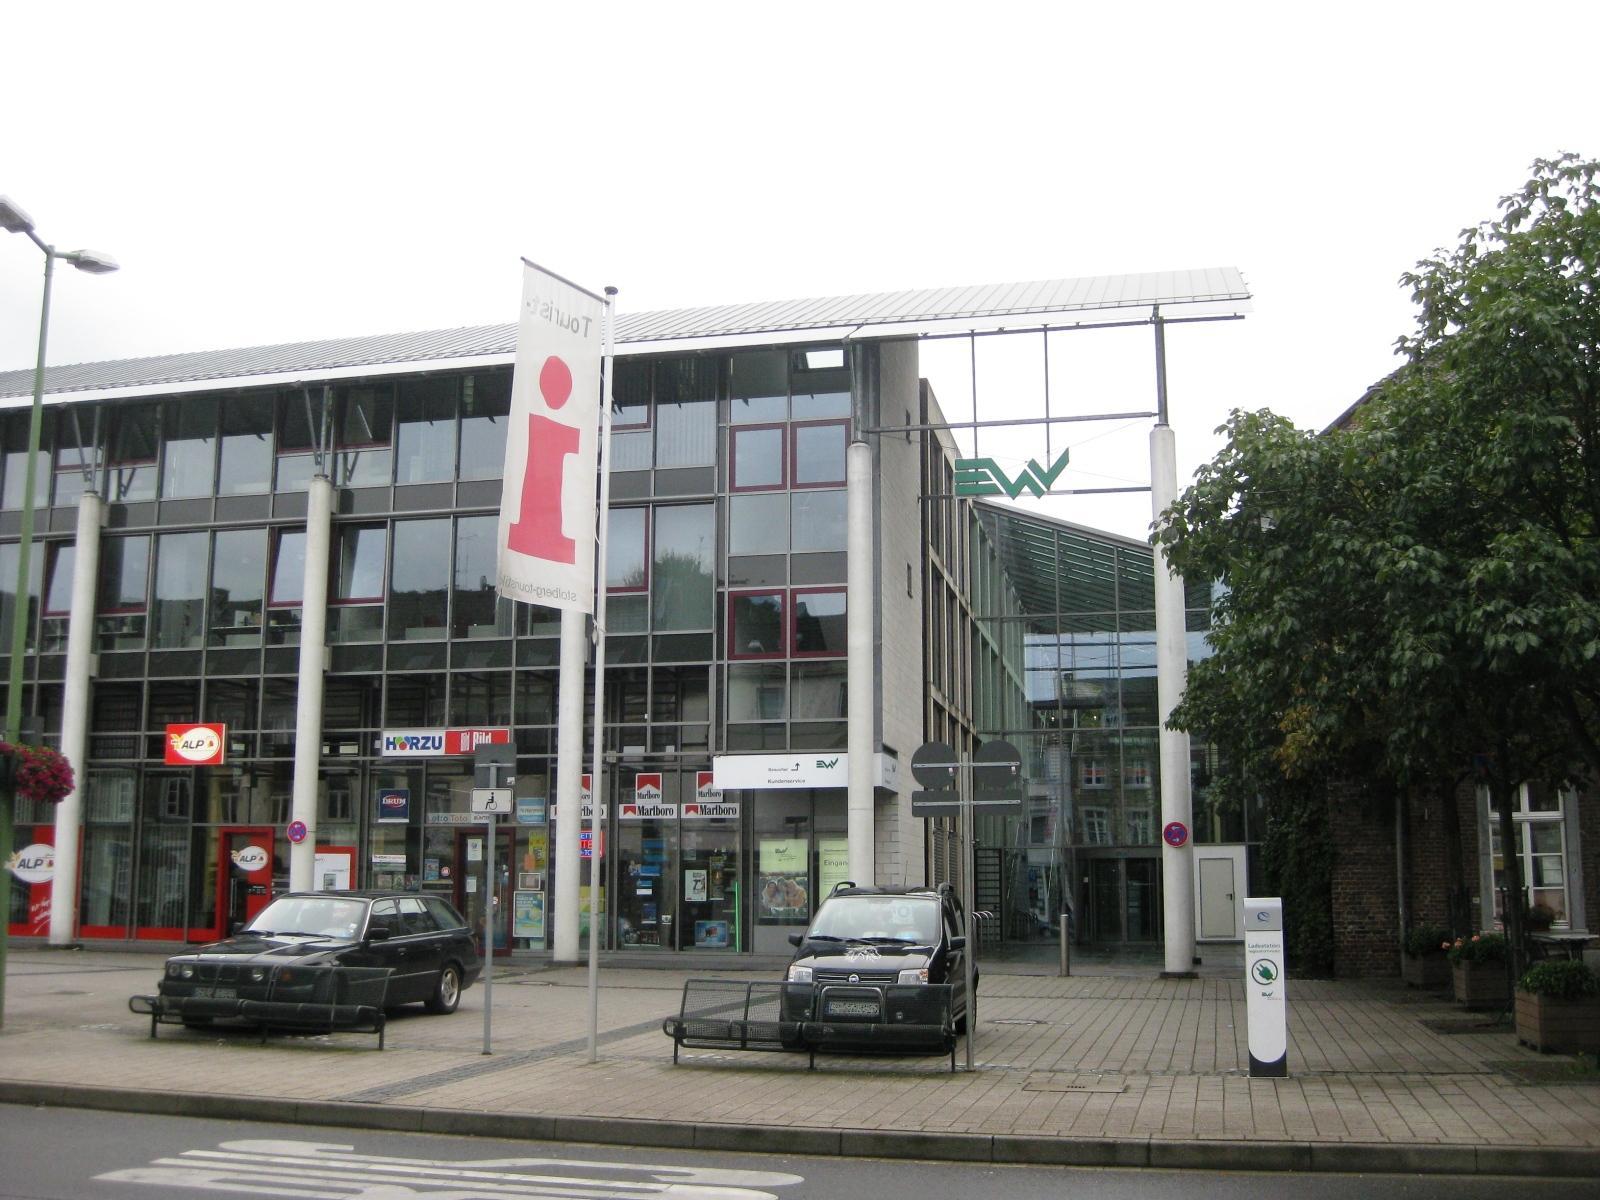 Eschweiler Use Of Colored Brick In His Buildings